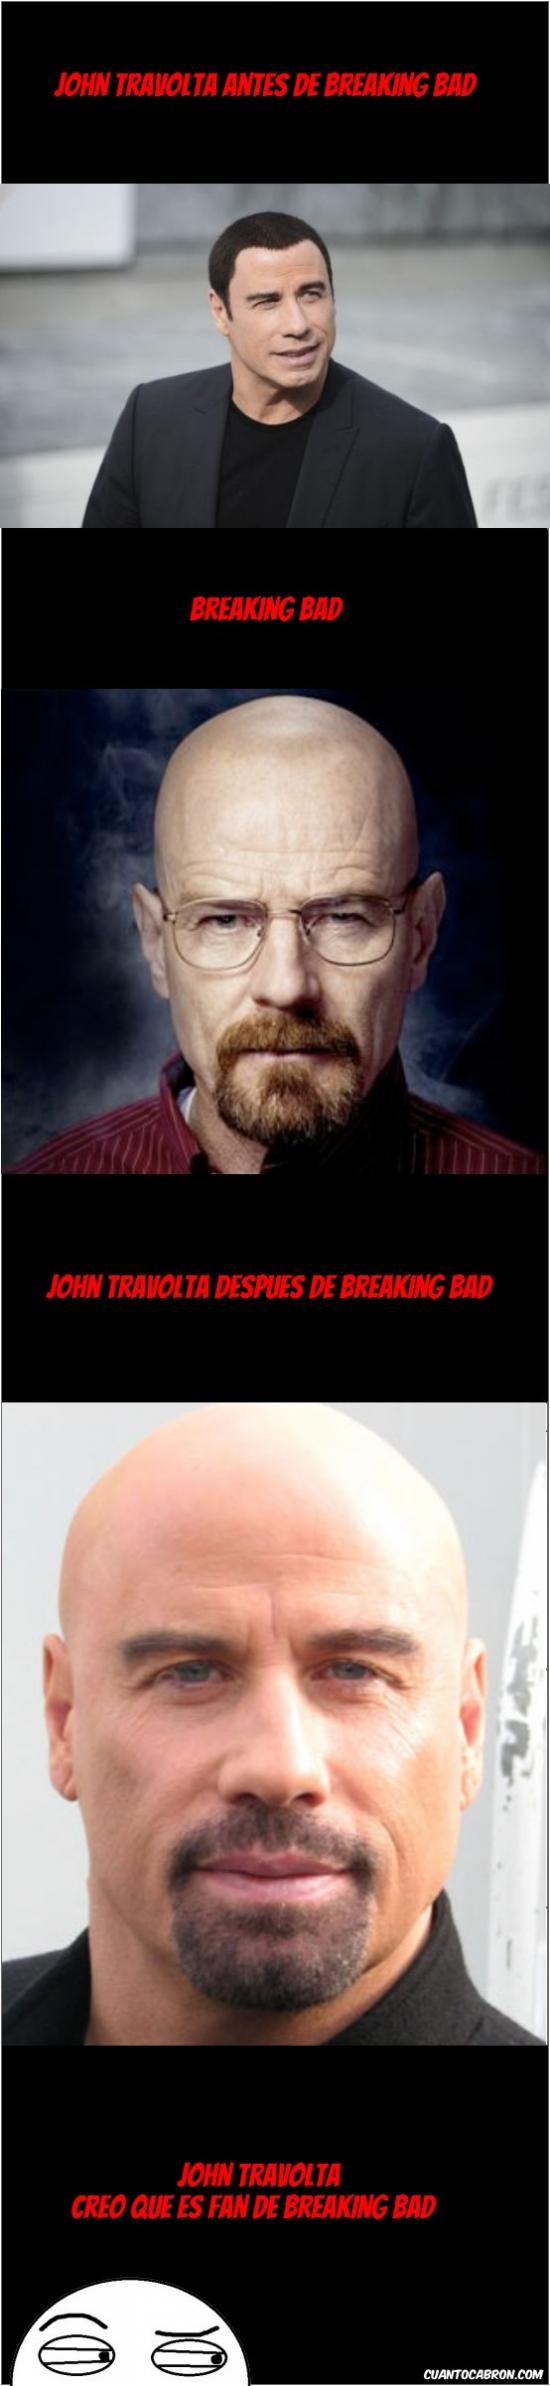 bad,breaking,calvo,cocina,John,meta,perilla,Travolta,walter white